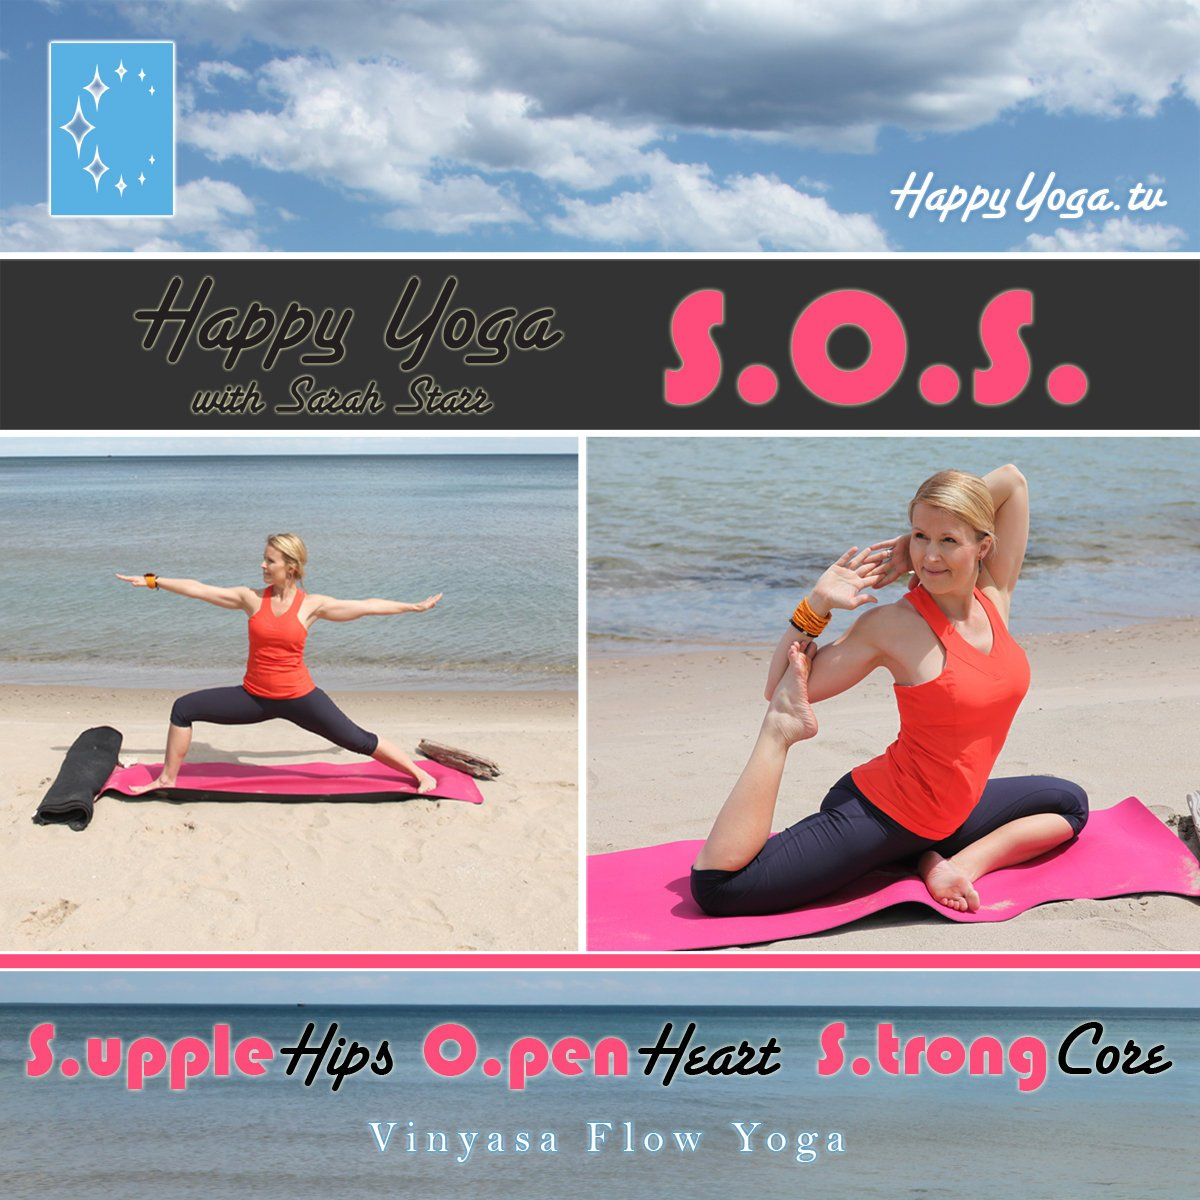 Amazon.com: Happy Yoga with Sarah Starr S.O.S.: ---